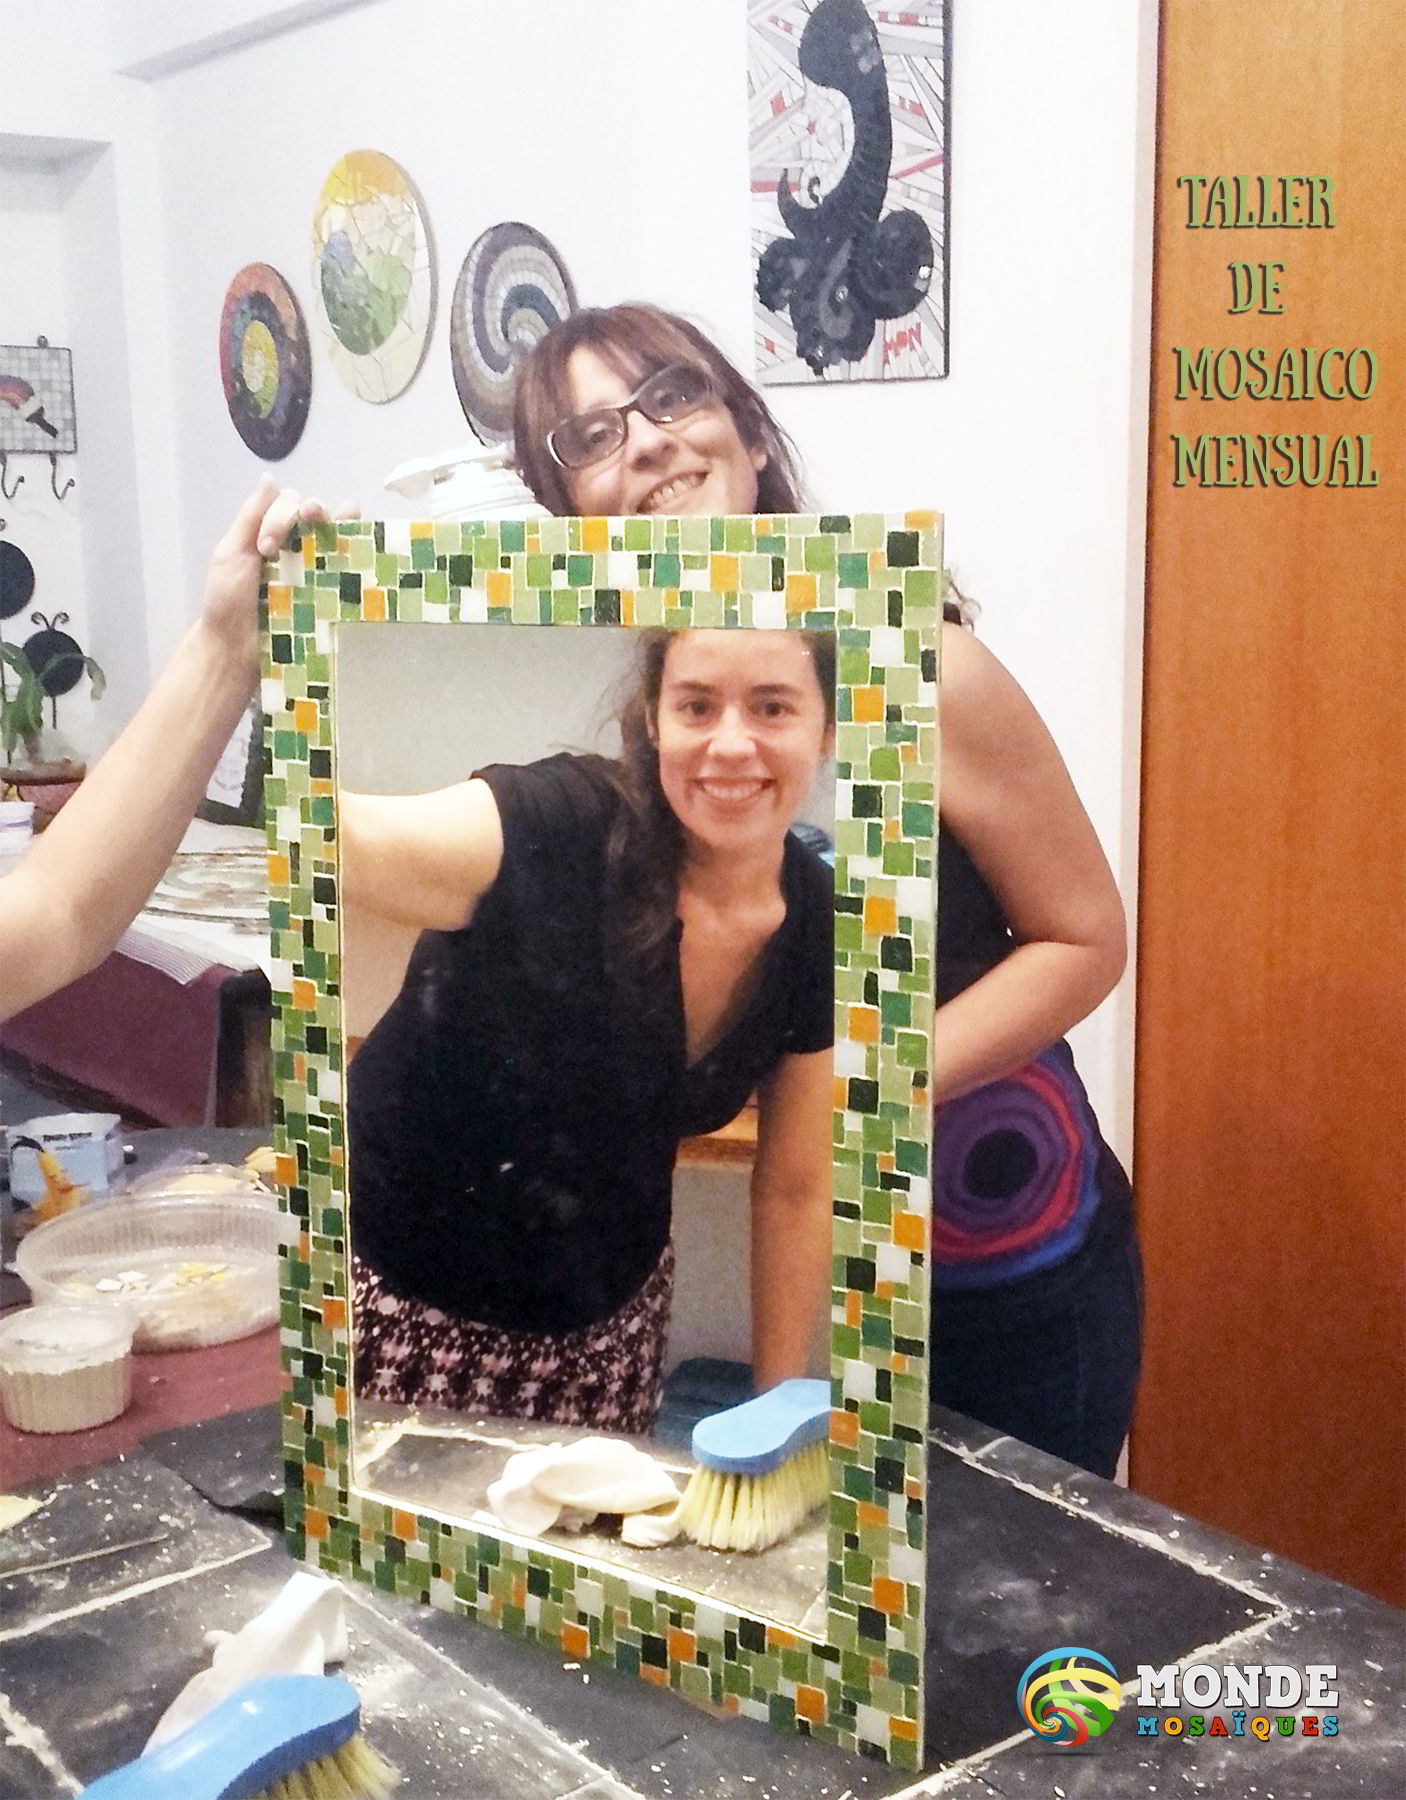 espejo, venecitas, mosaico, taller